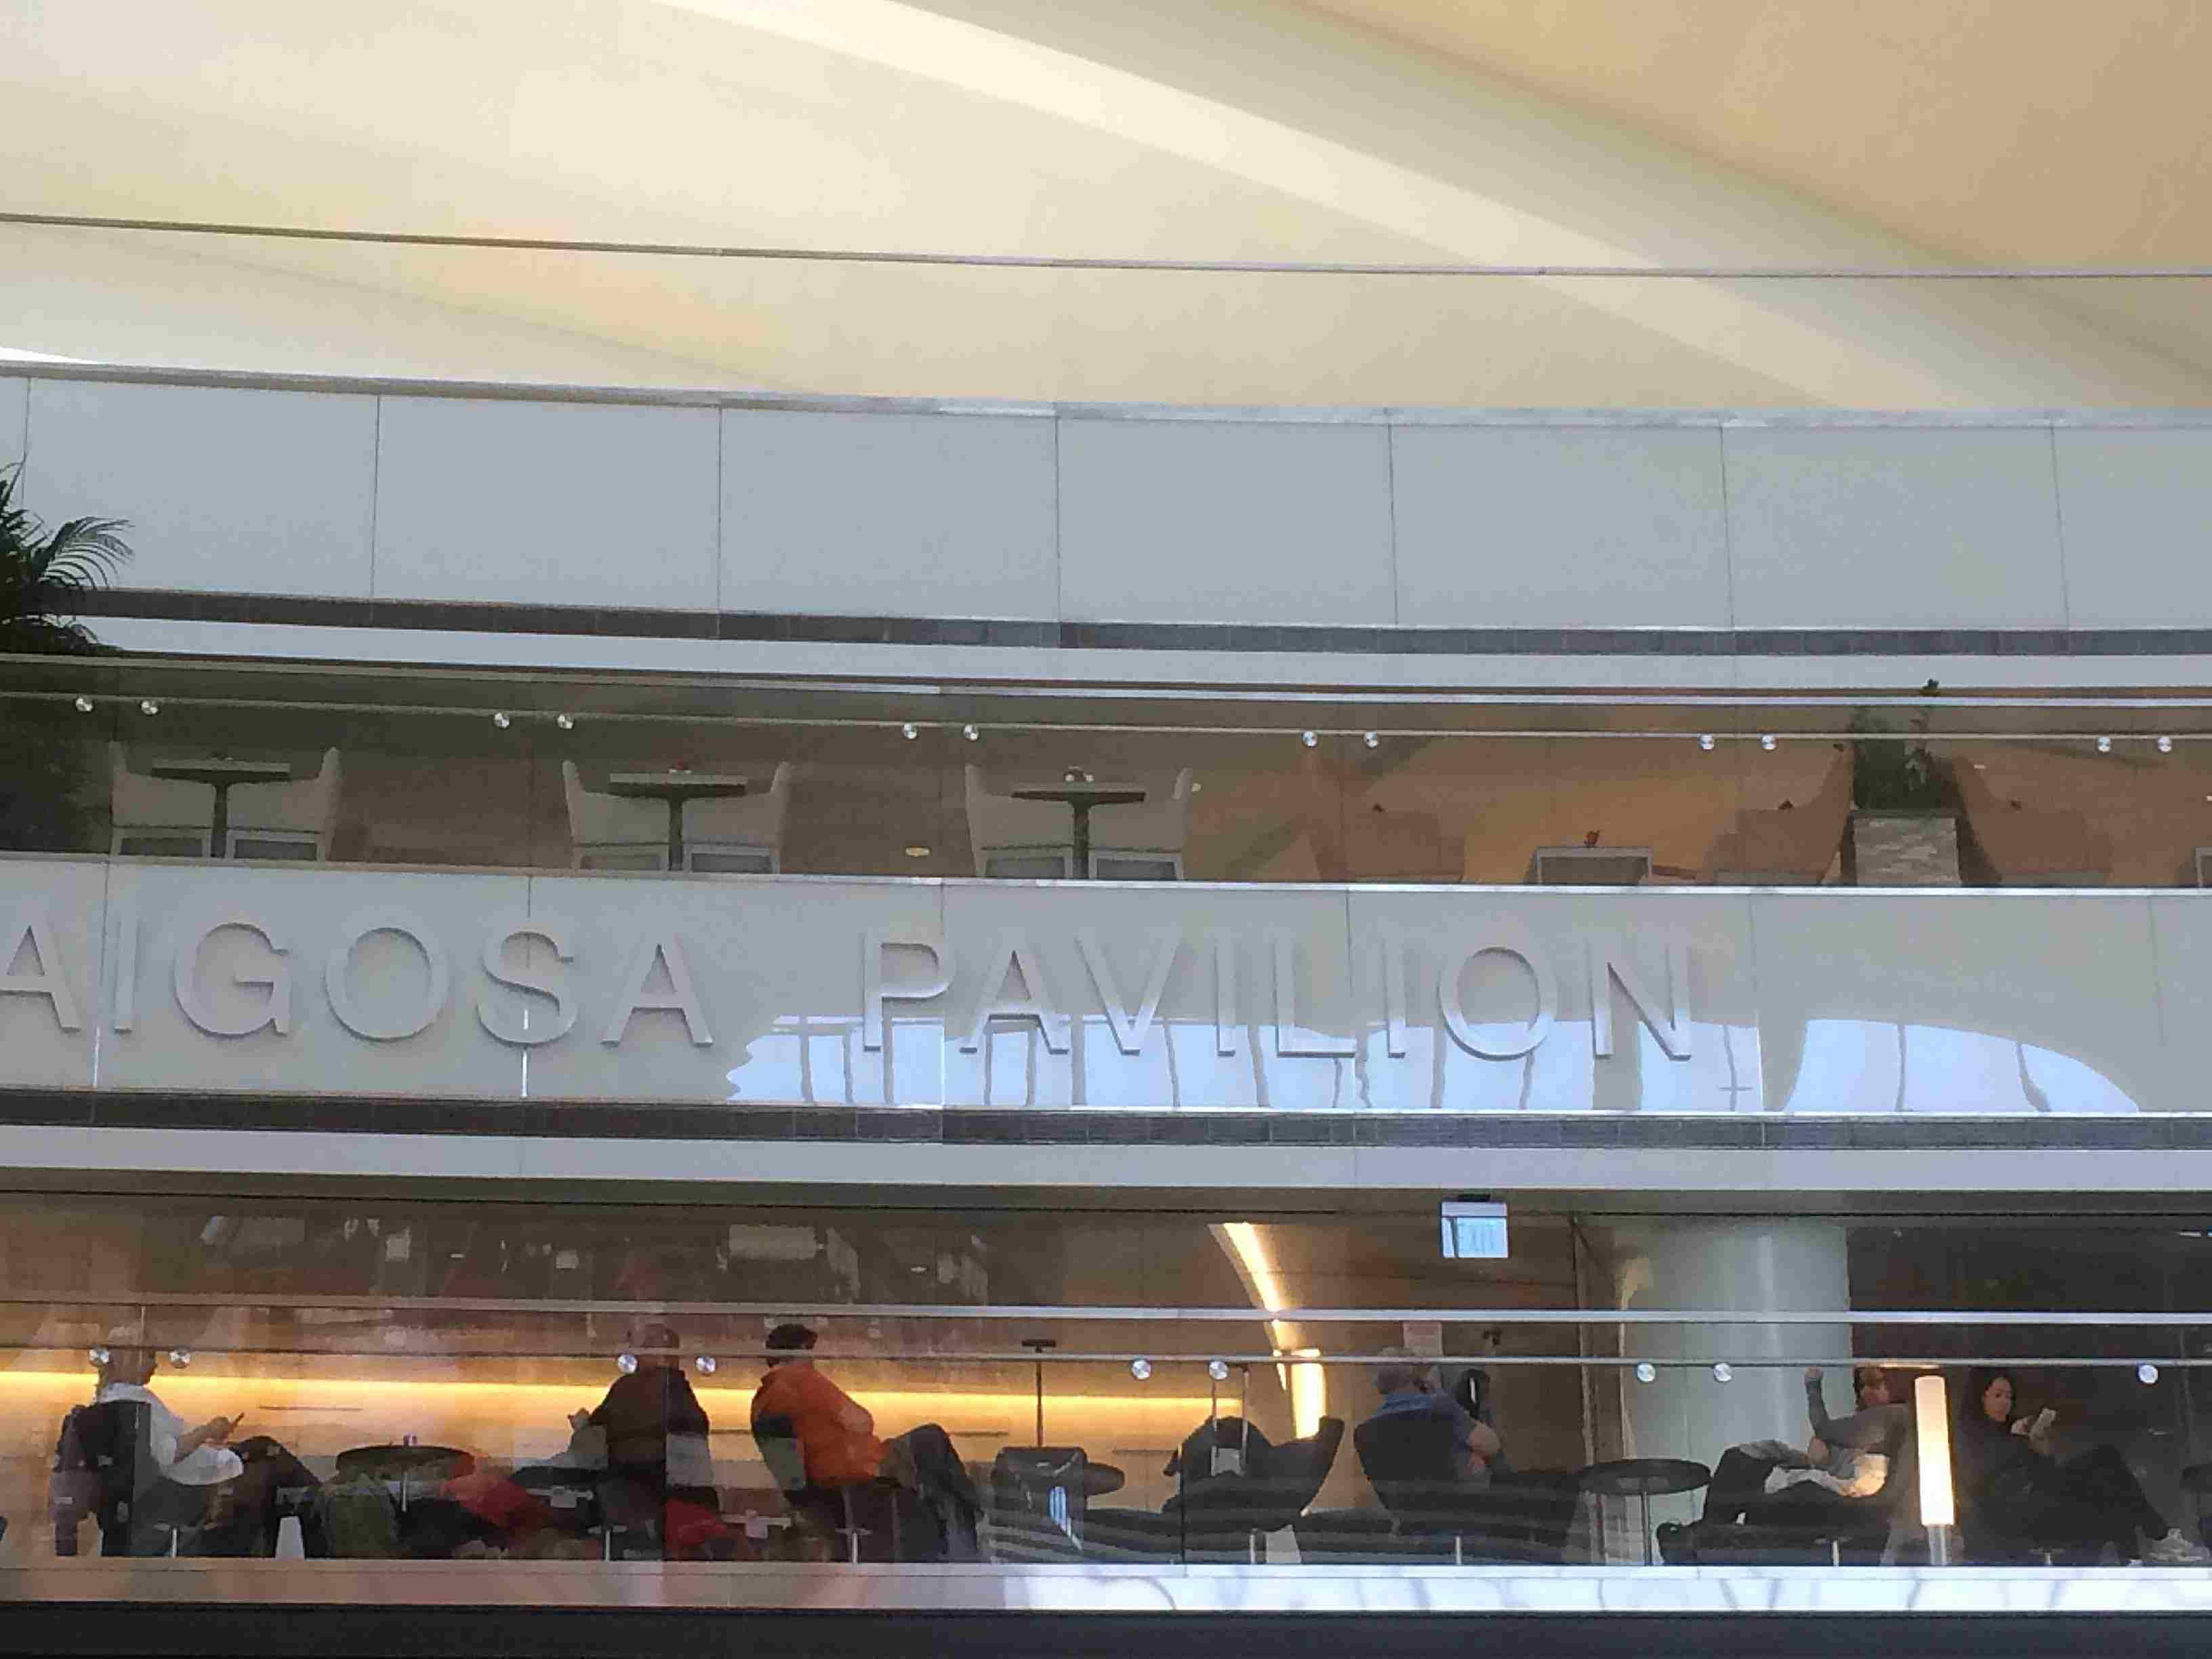 The Villaraigosa Pavilion in the Tom Bradley International Terminal in Los Angeles International Airport.